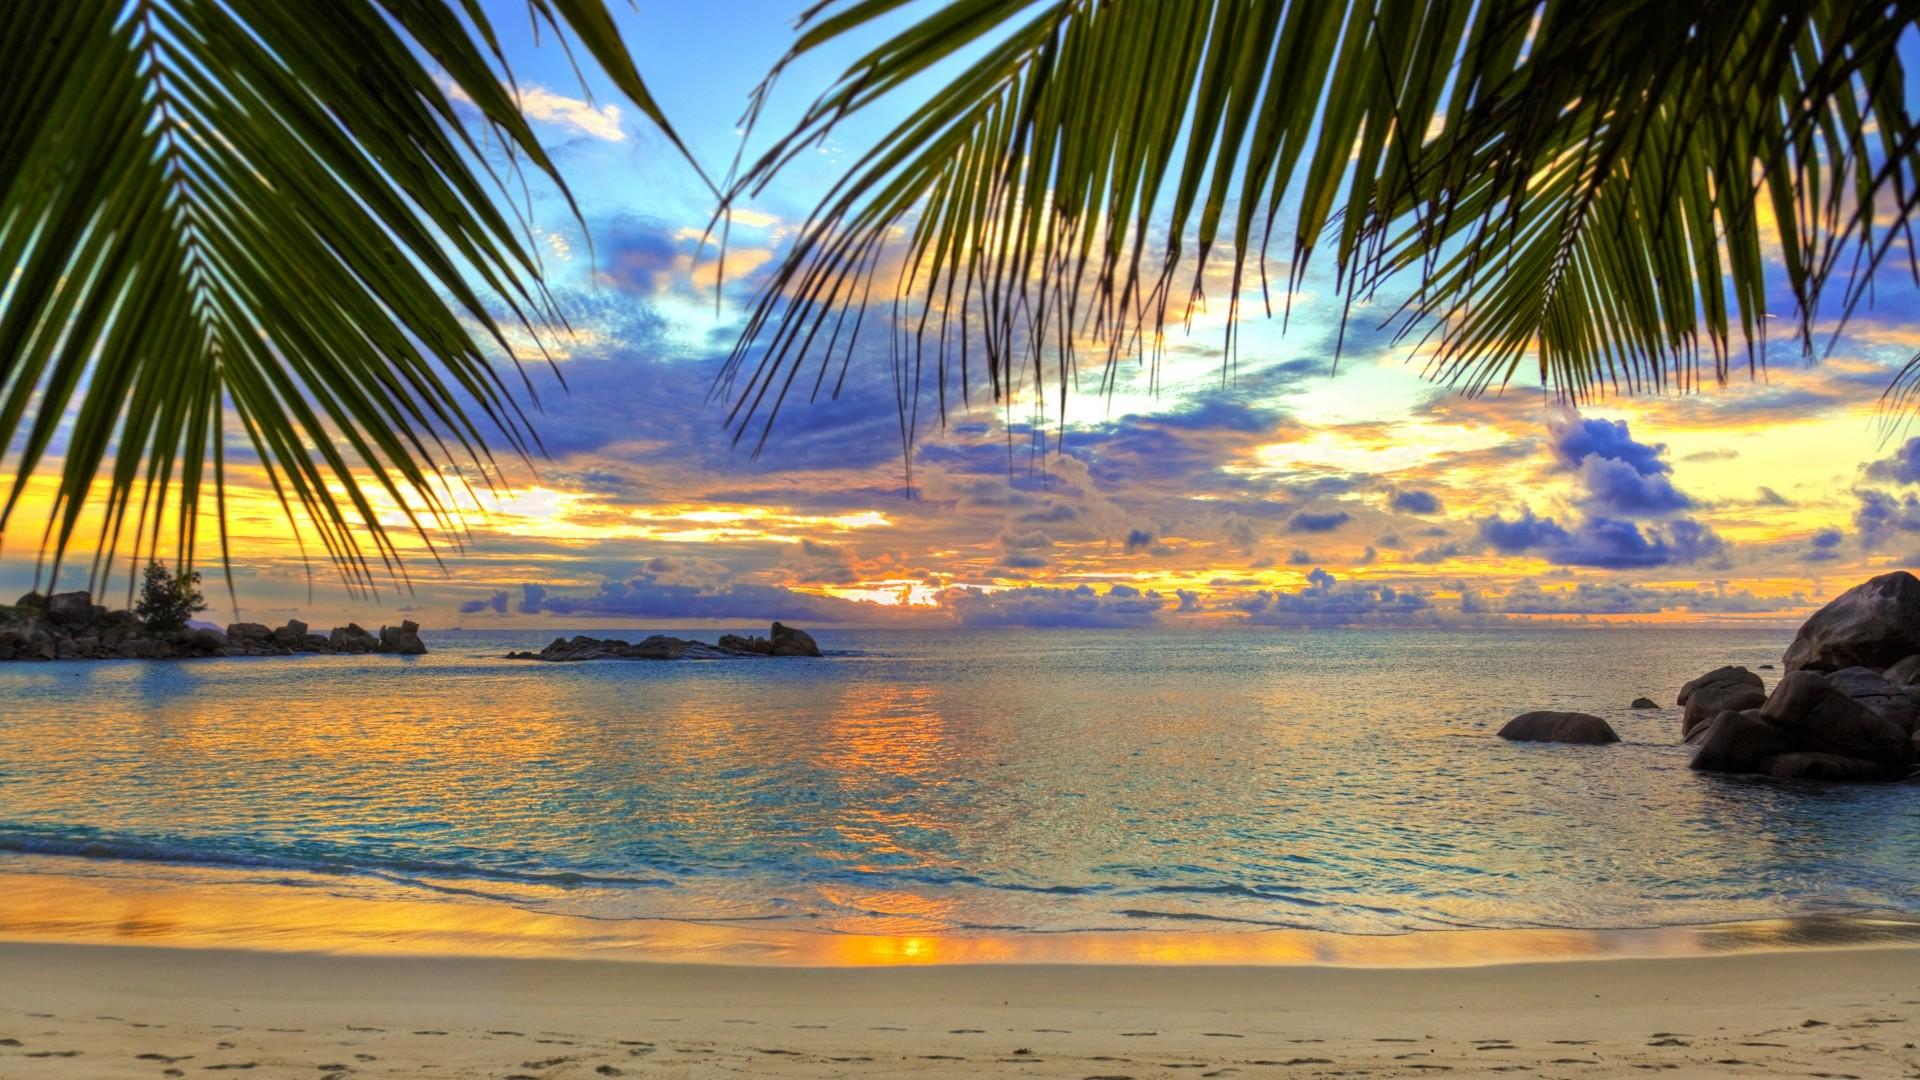 Wallpaper beach, tropics, sea, sand, palm trees